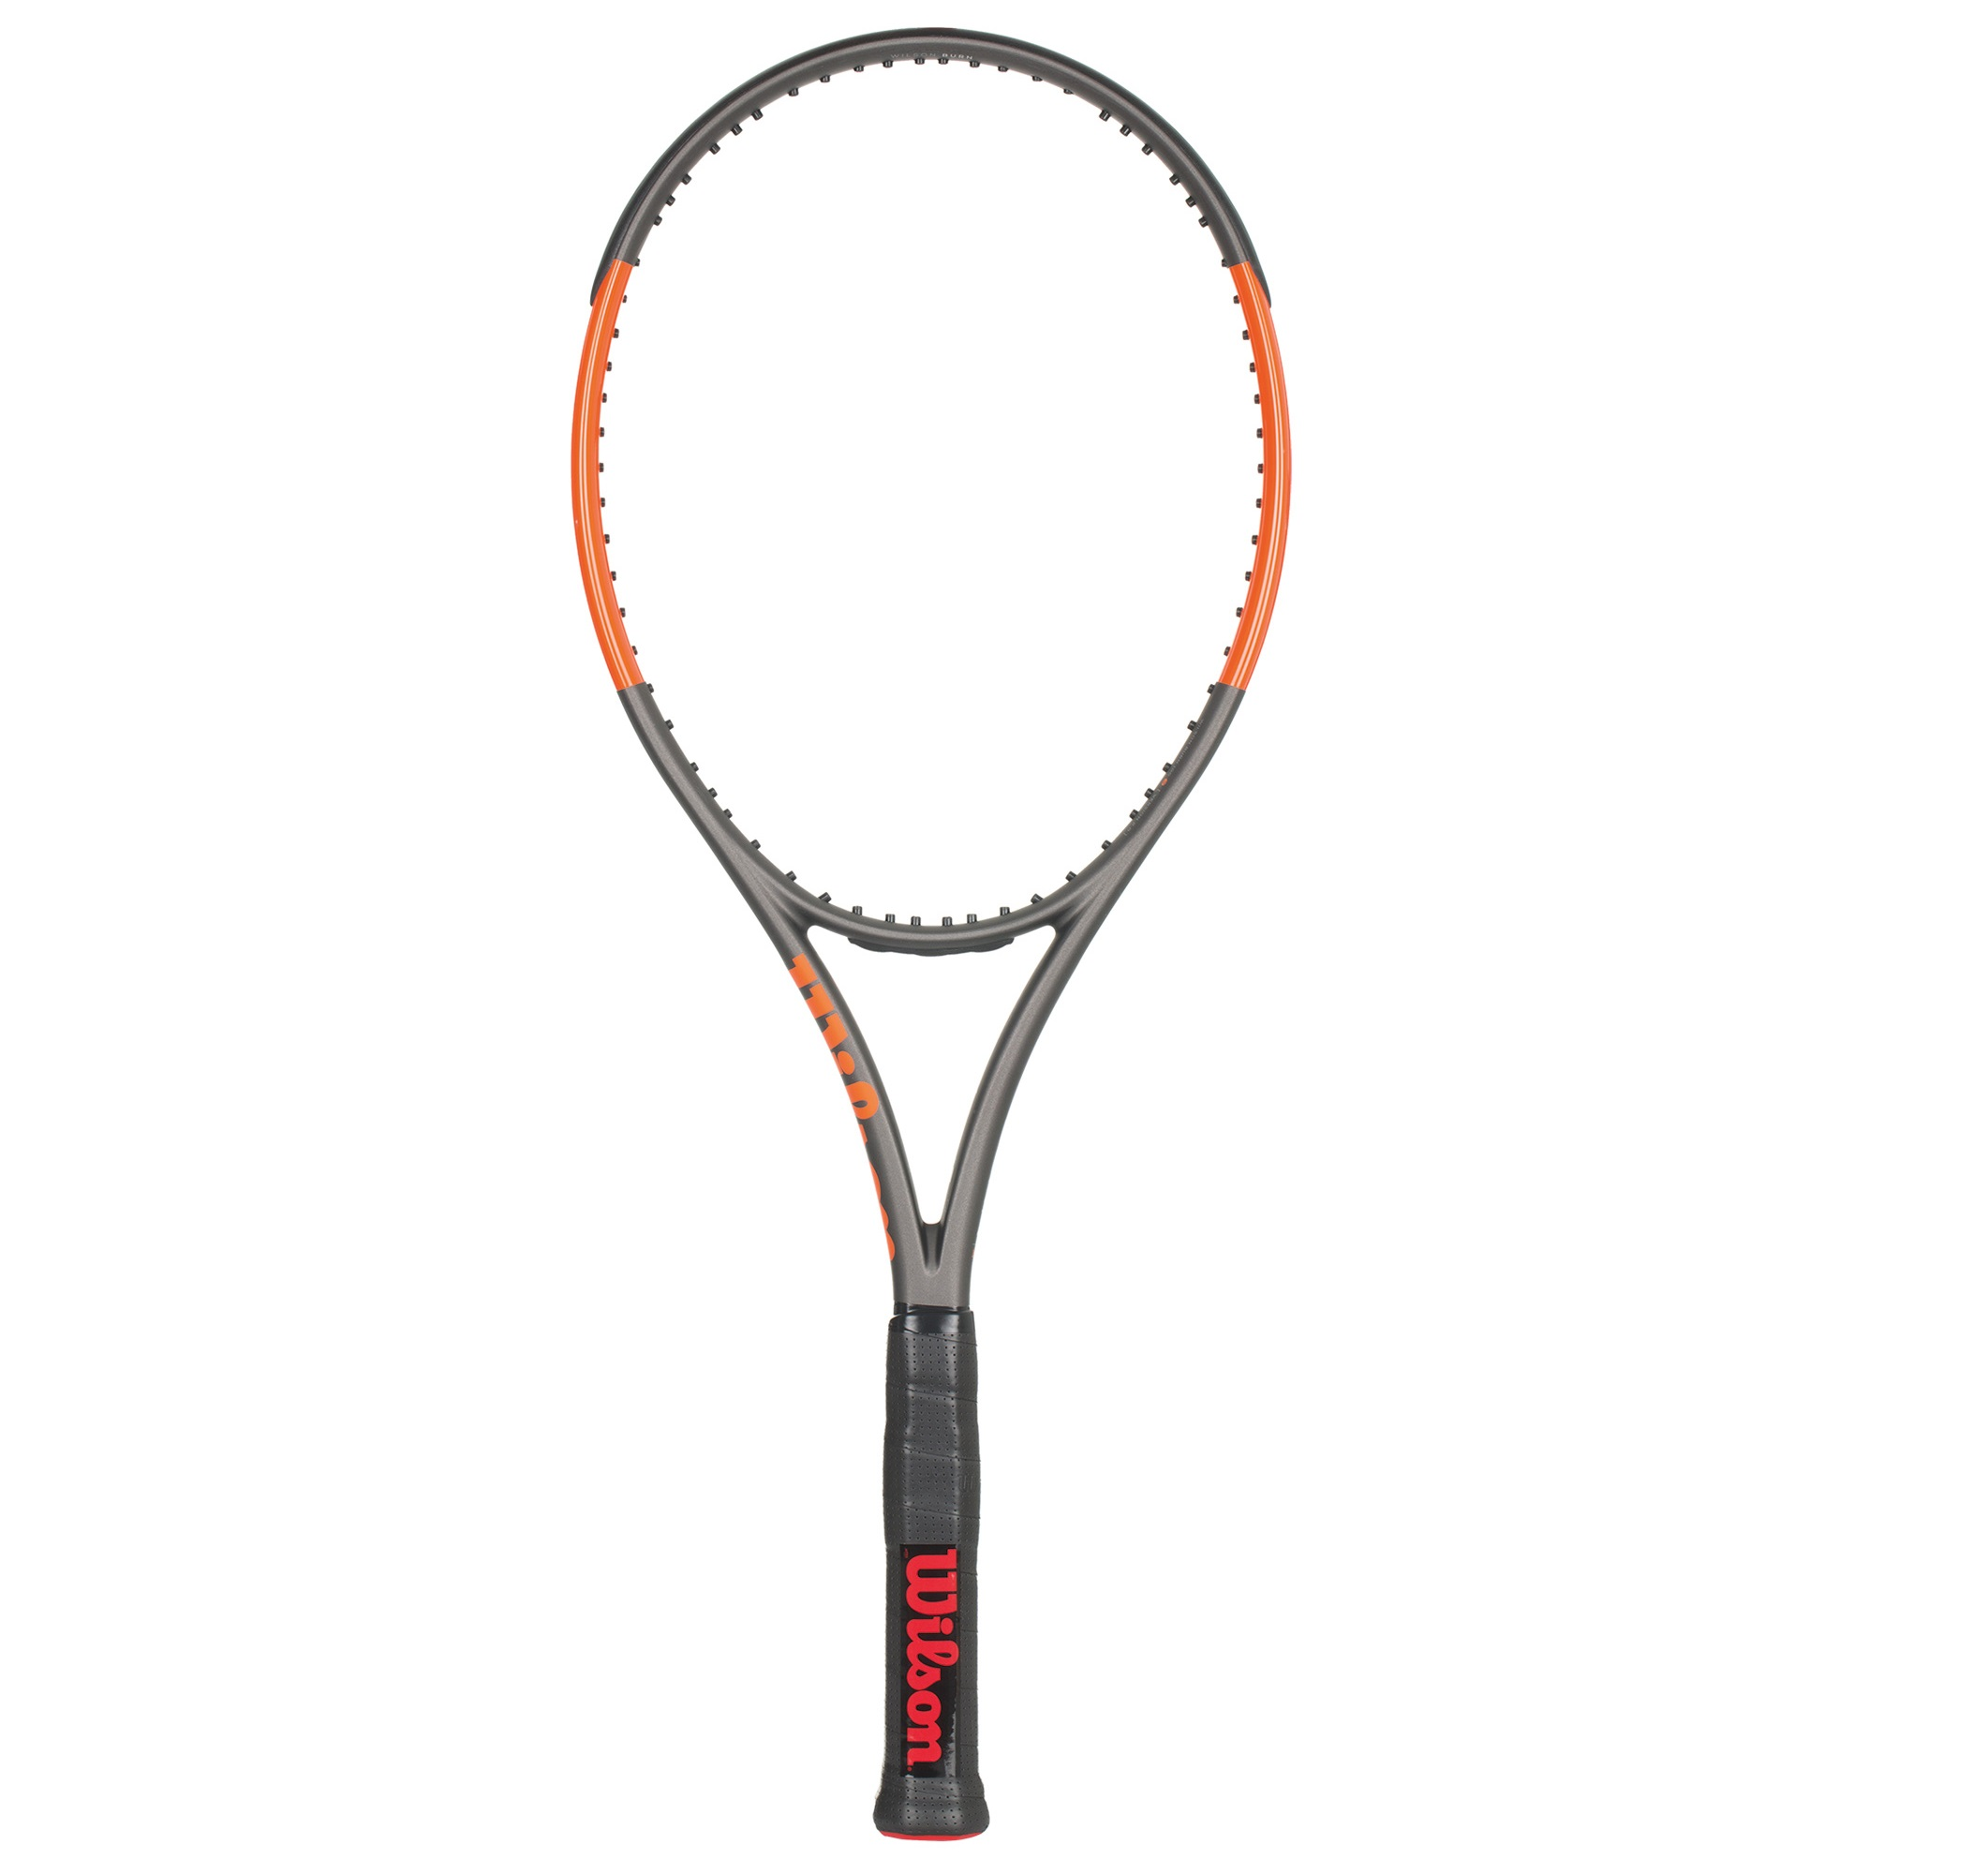 Wilson Ракетка для большого тенниса Wilson Burn 100 CV wilson набор мячей для большого тенниса wilson us open x3 размер без размера